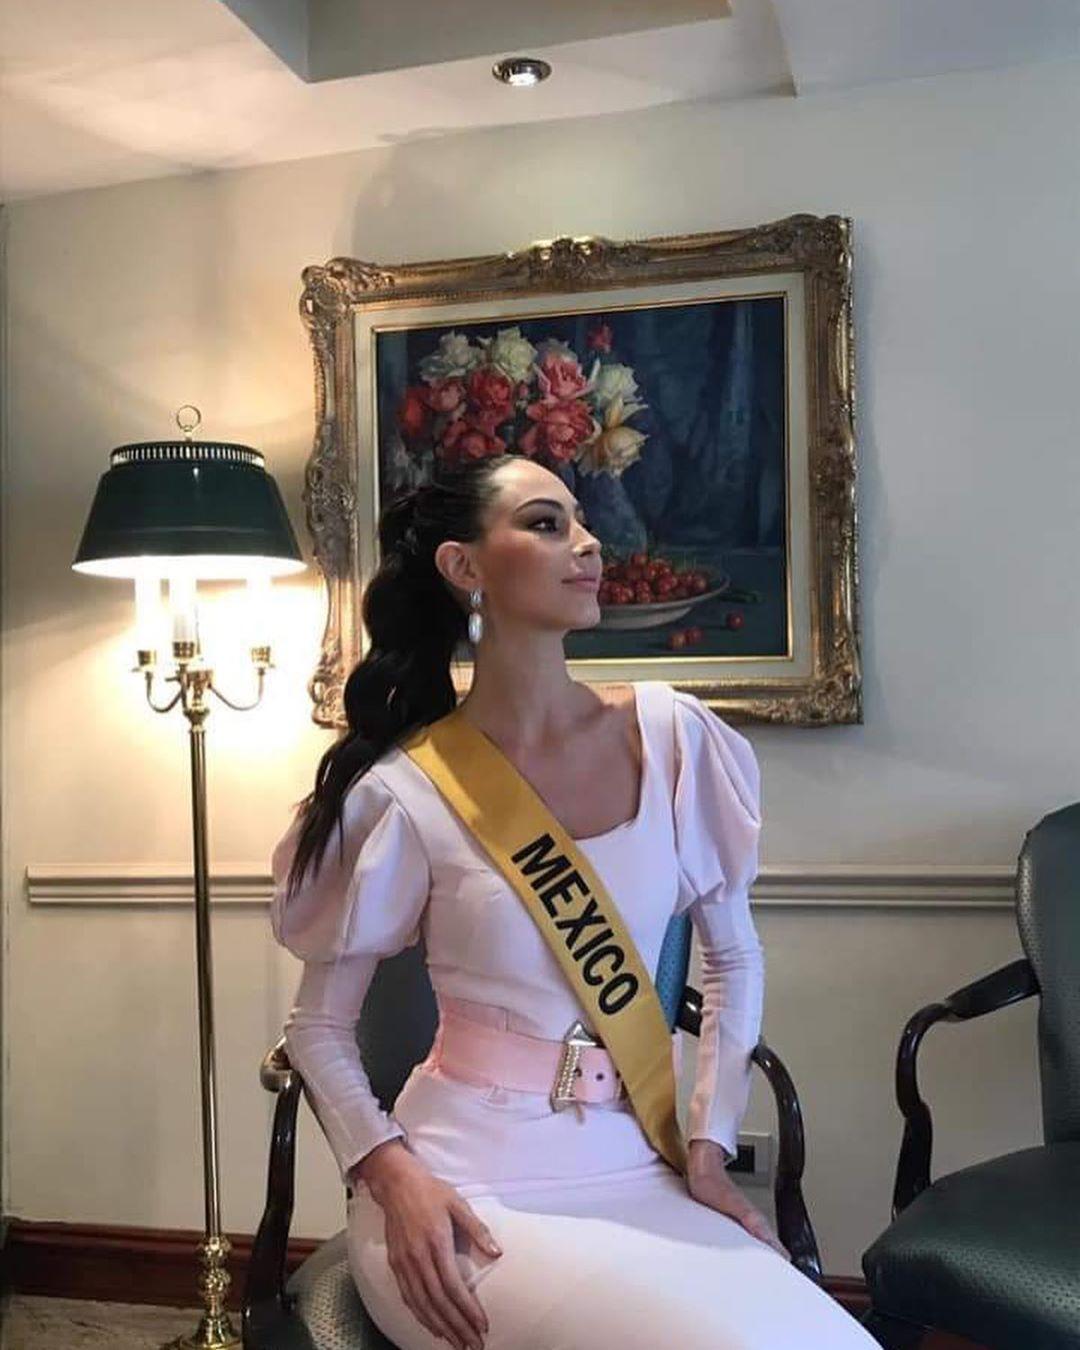 maria malo, 1st runner-up de miss grand international 2019. - Página 17 73269910